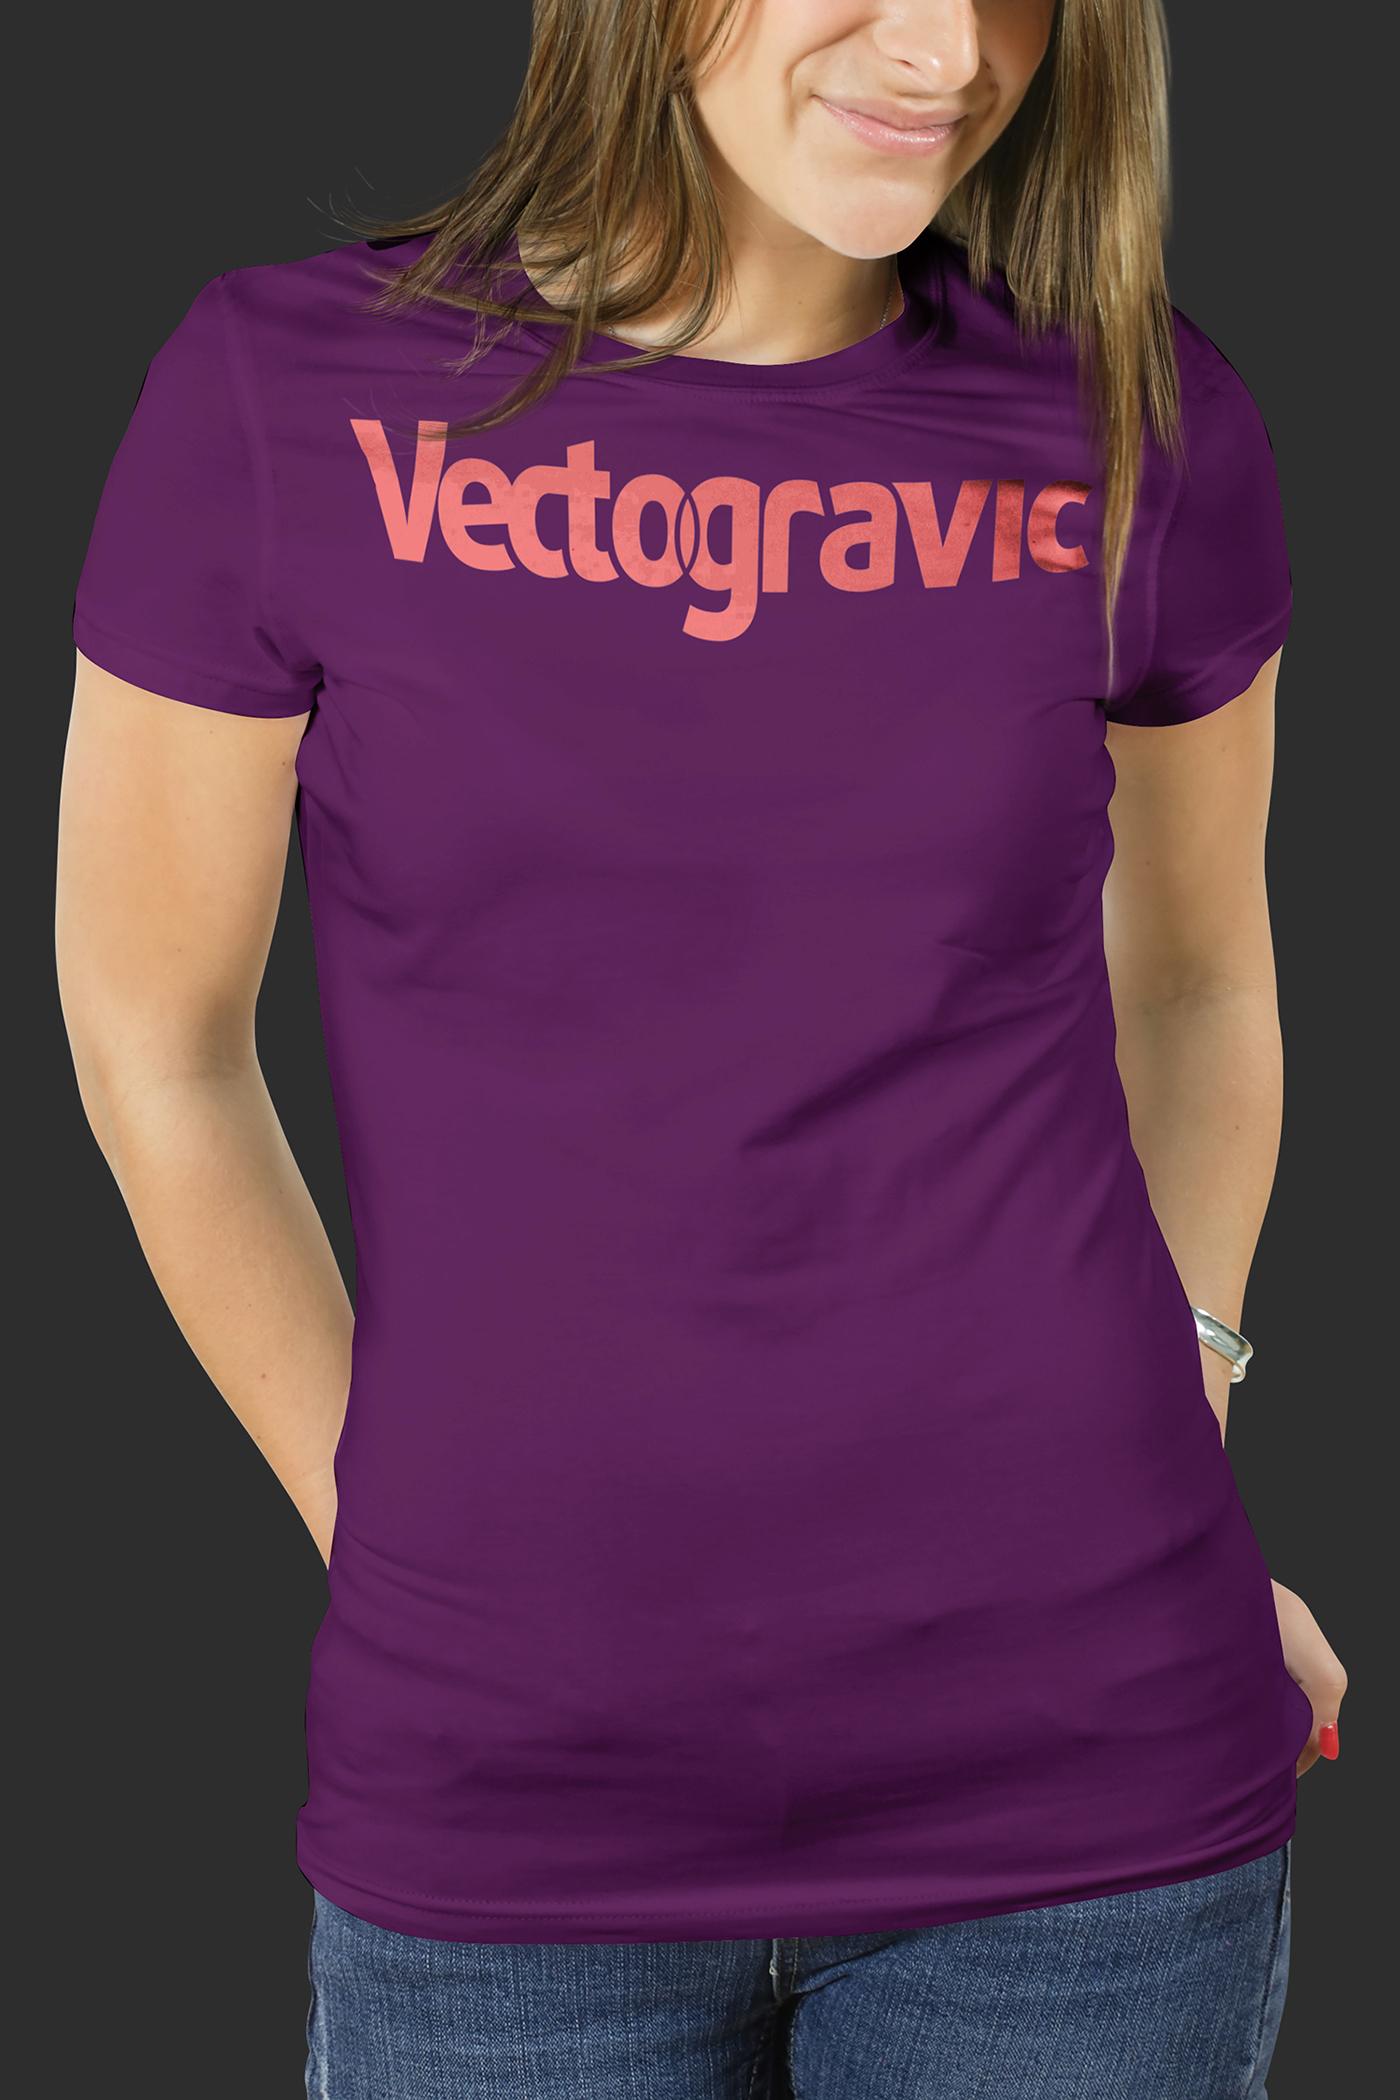 Clothing design female male mock-up product mockup t-shirt tshirt free mockup  psd mockup